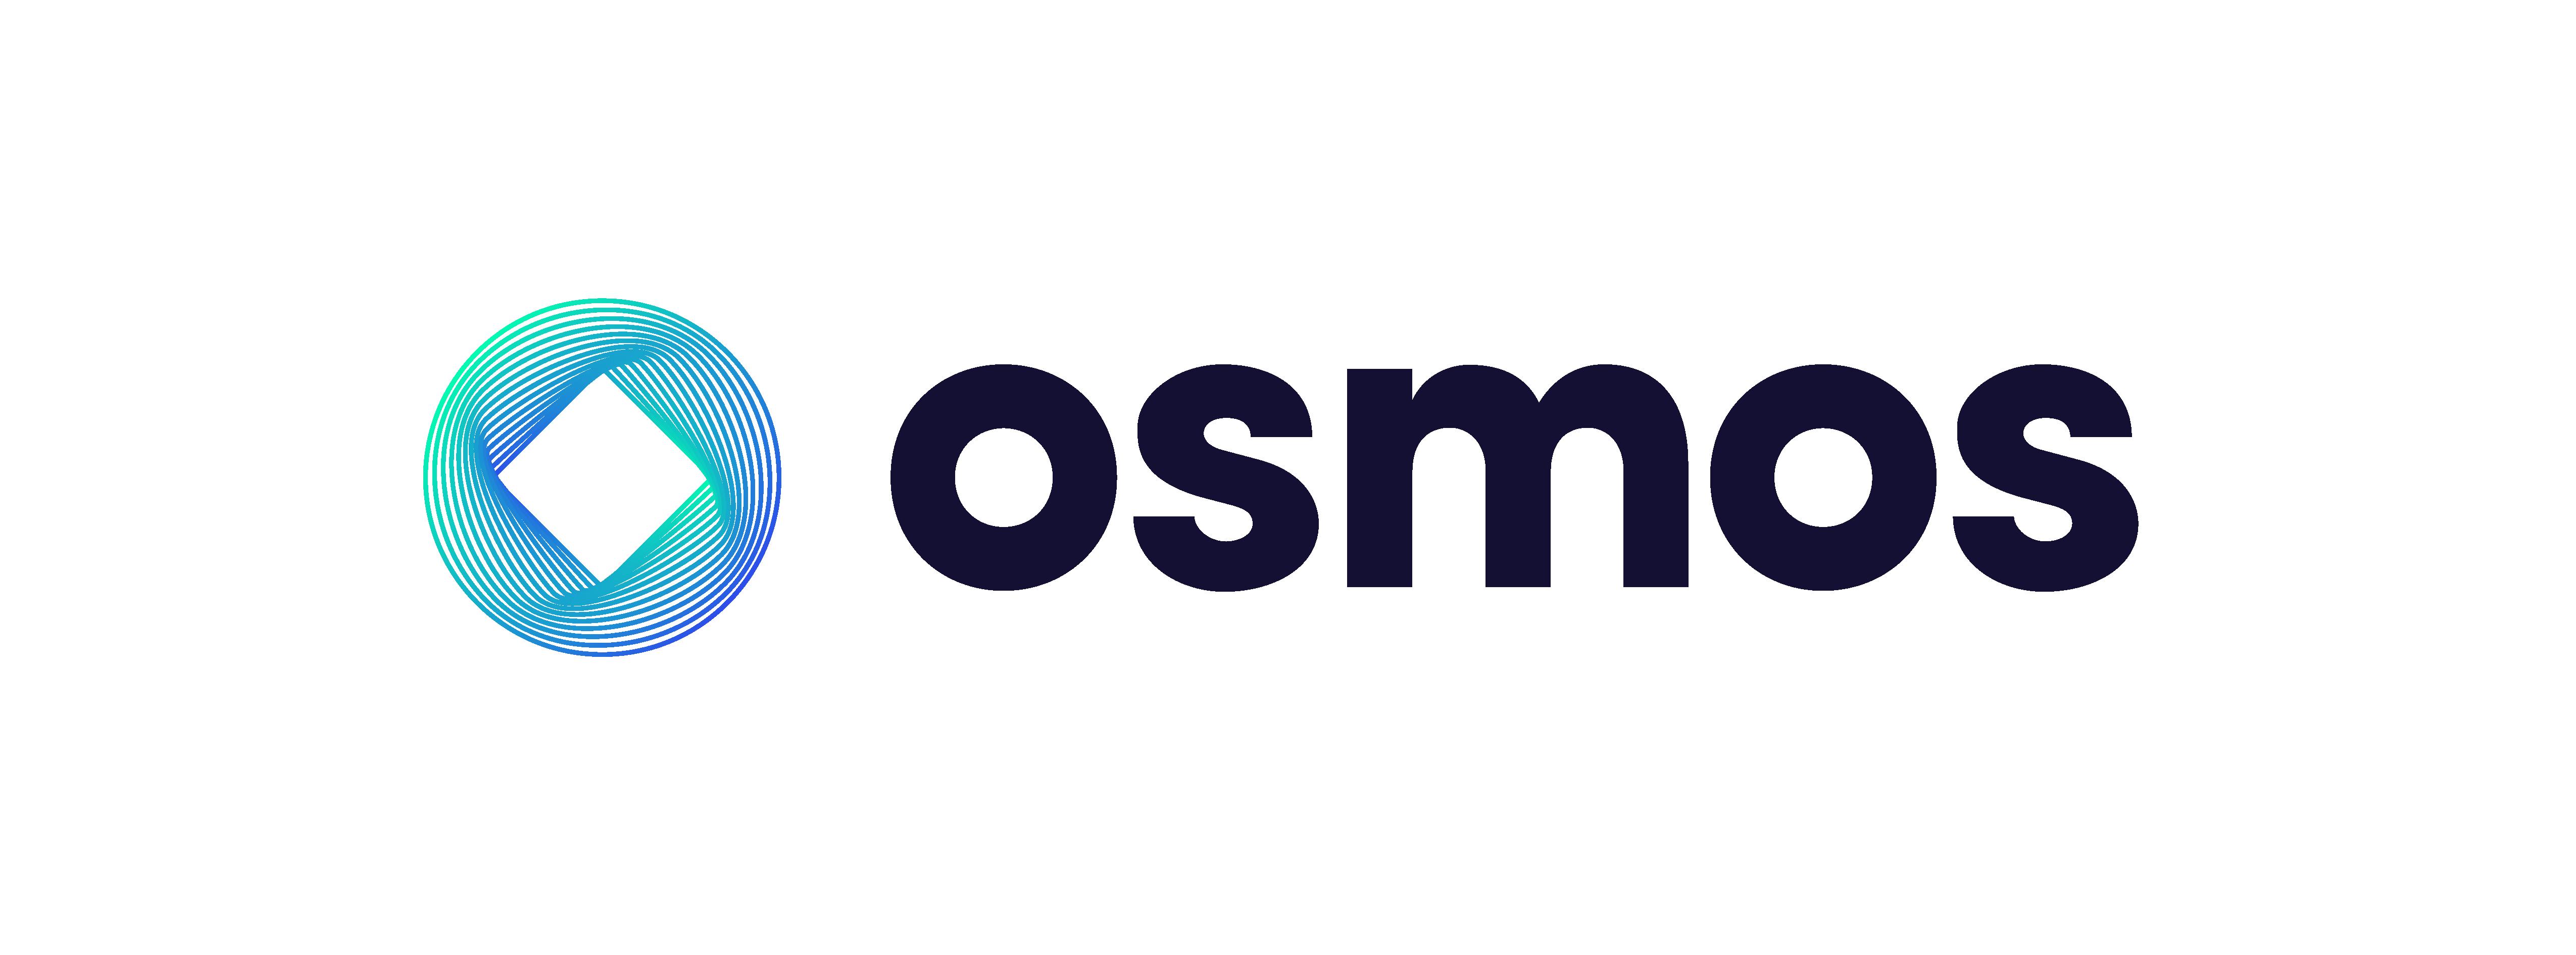 Osmos_logotipo-01-01